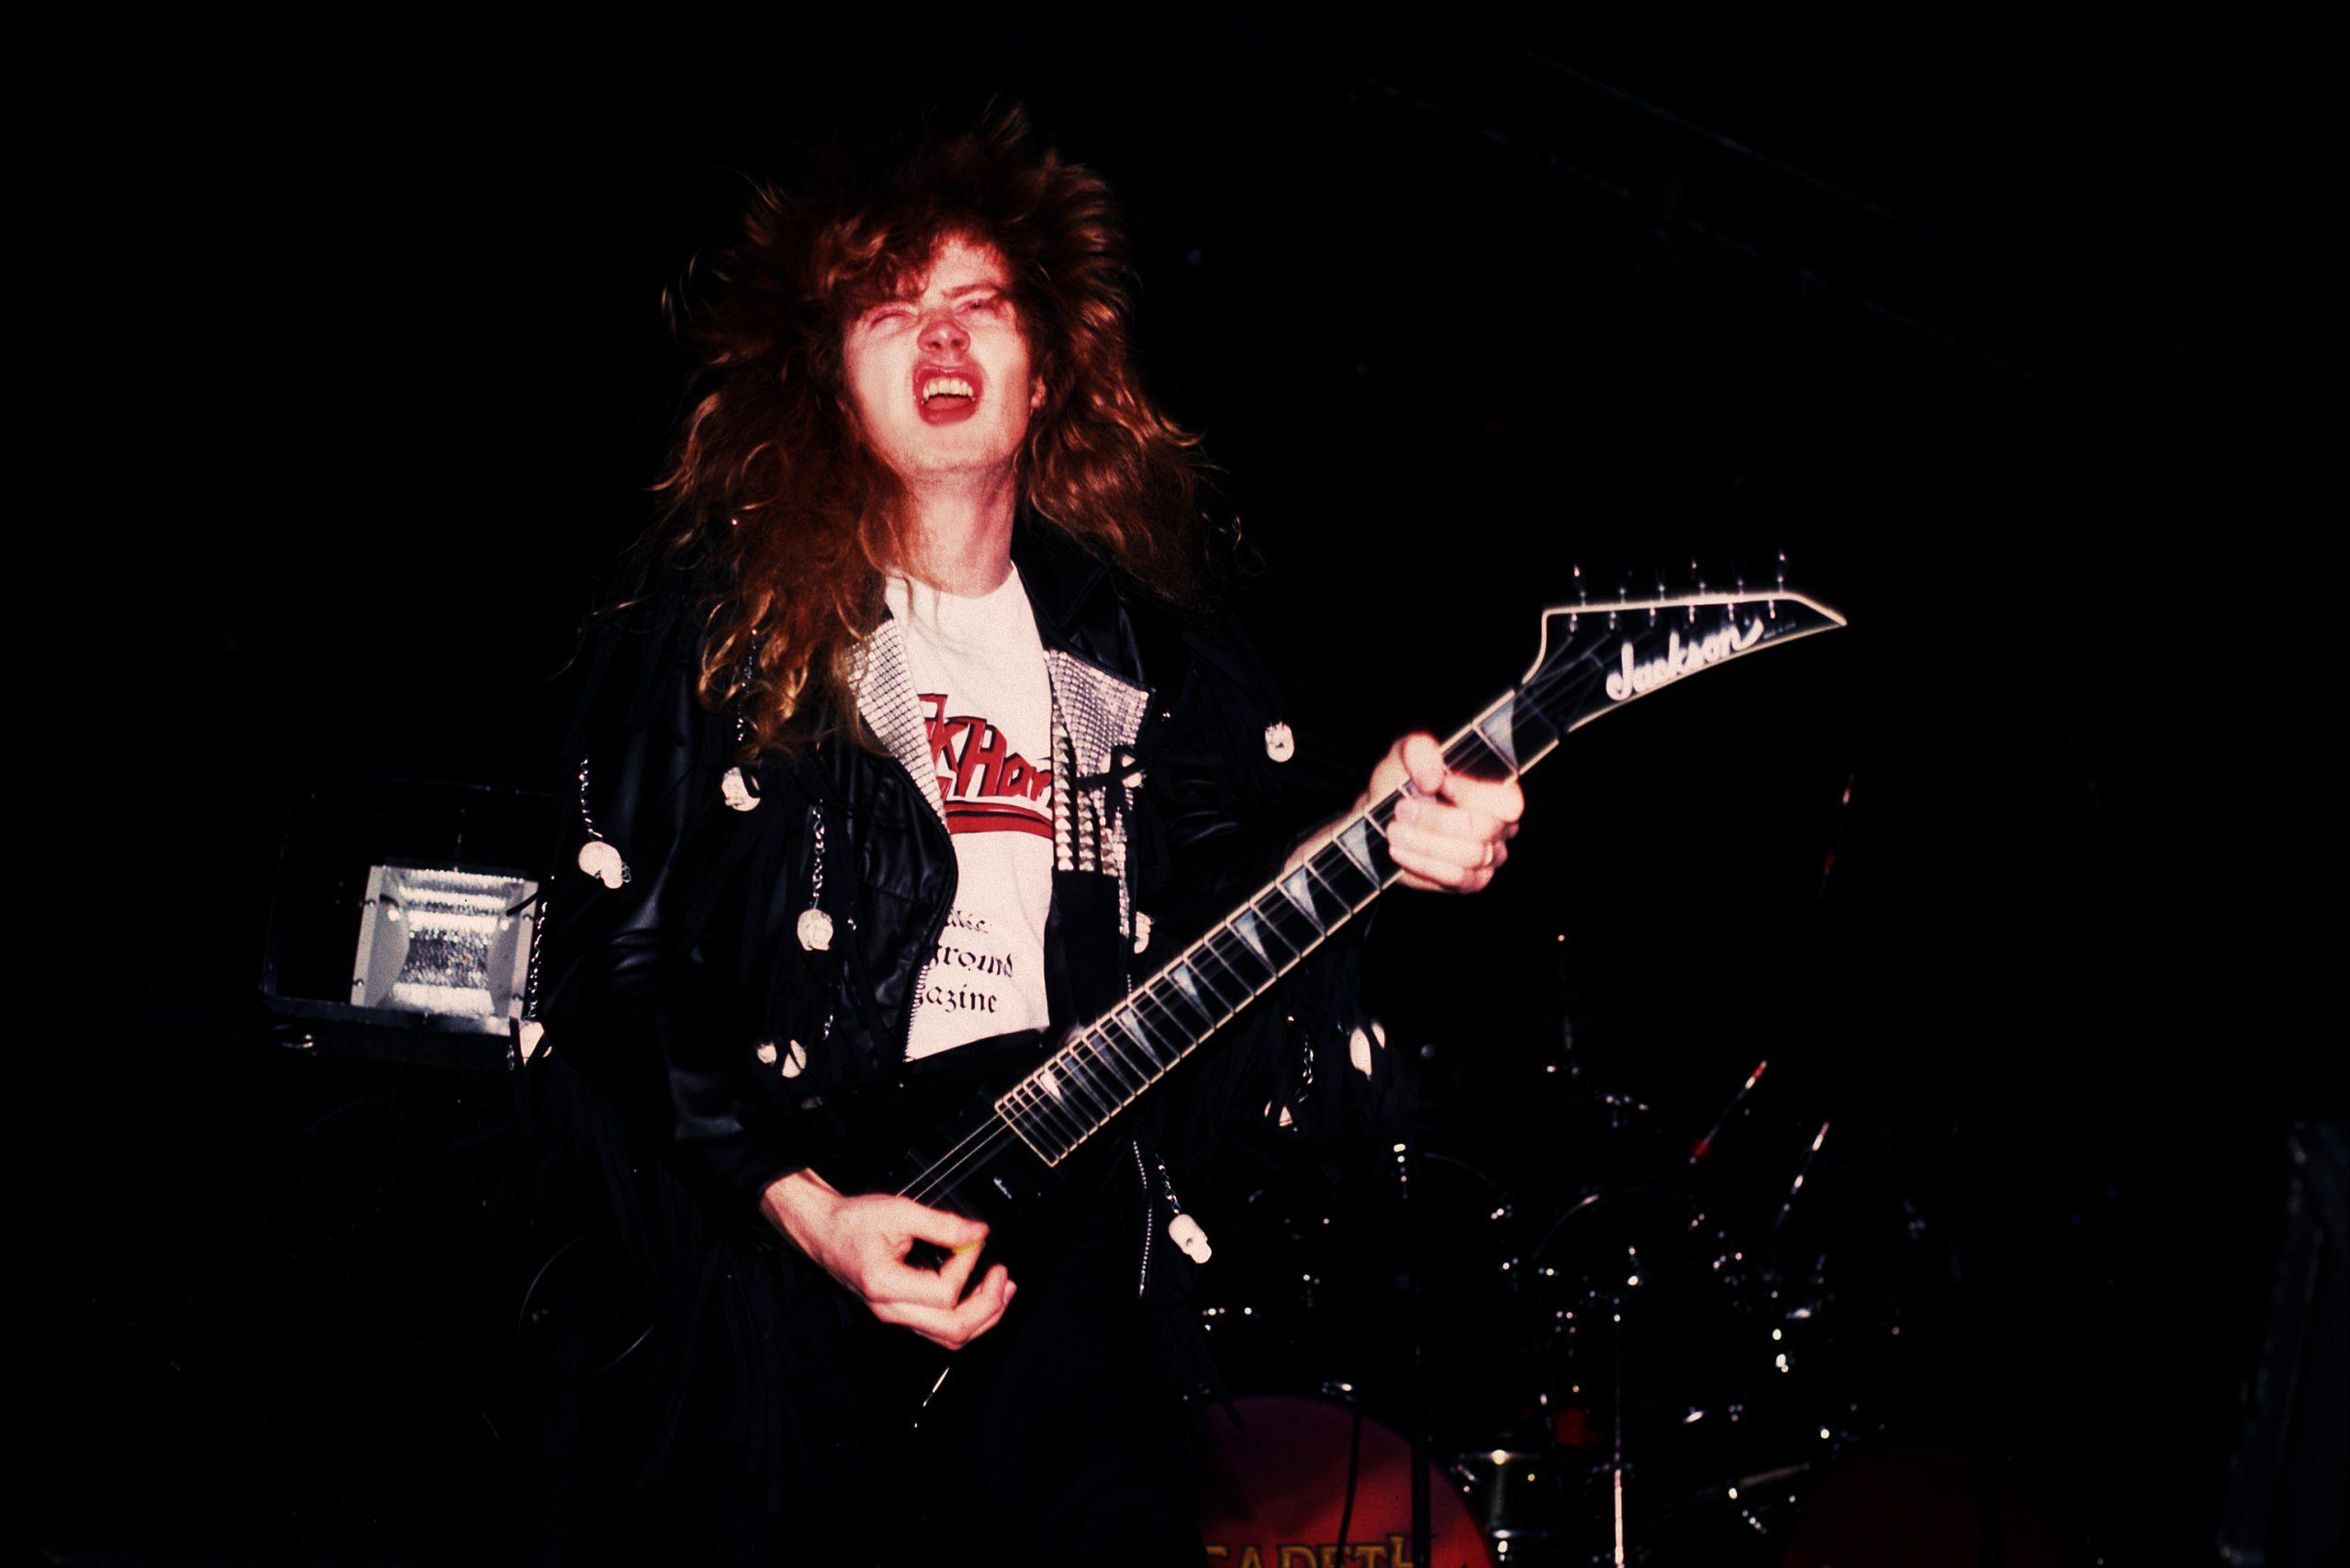 mustaine-thrash-metal